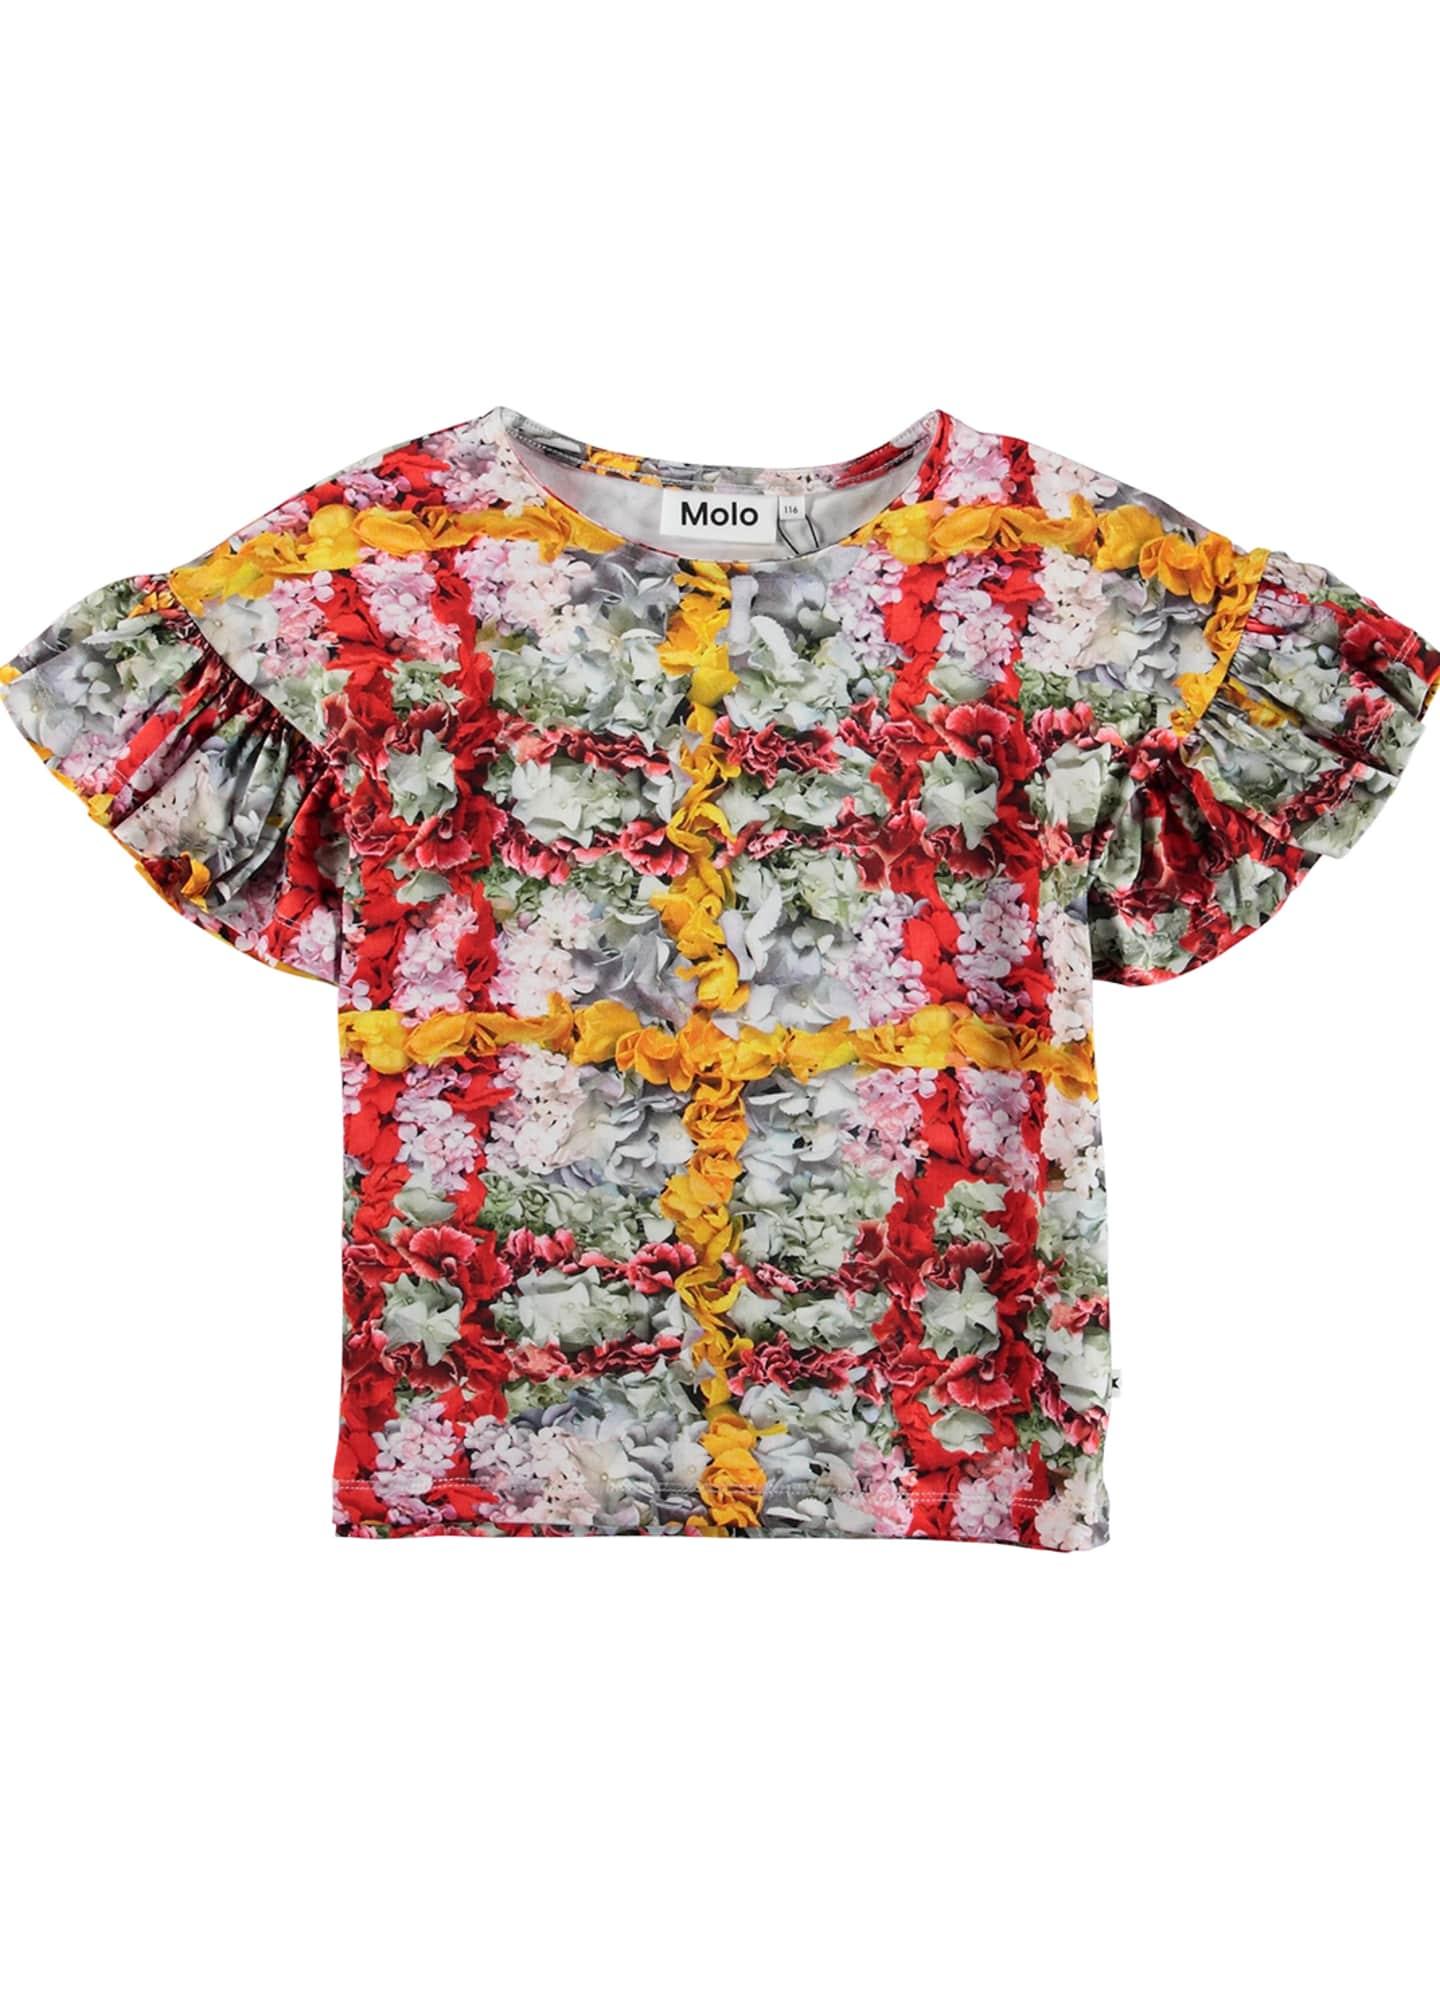 Molo Rayah Floral Print Tee w/ Ruffle Sleeves,